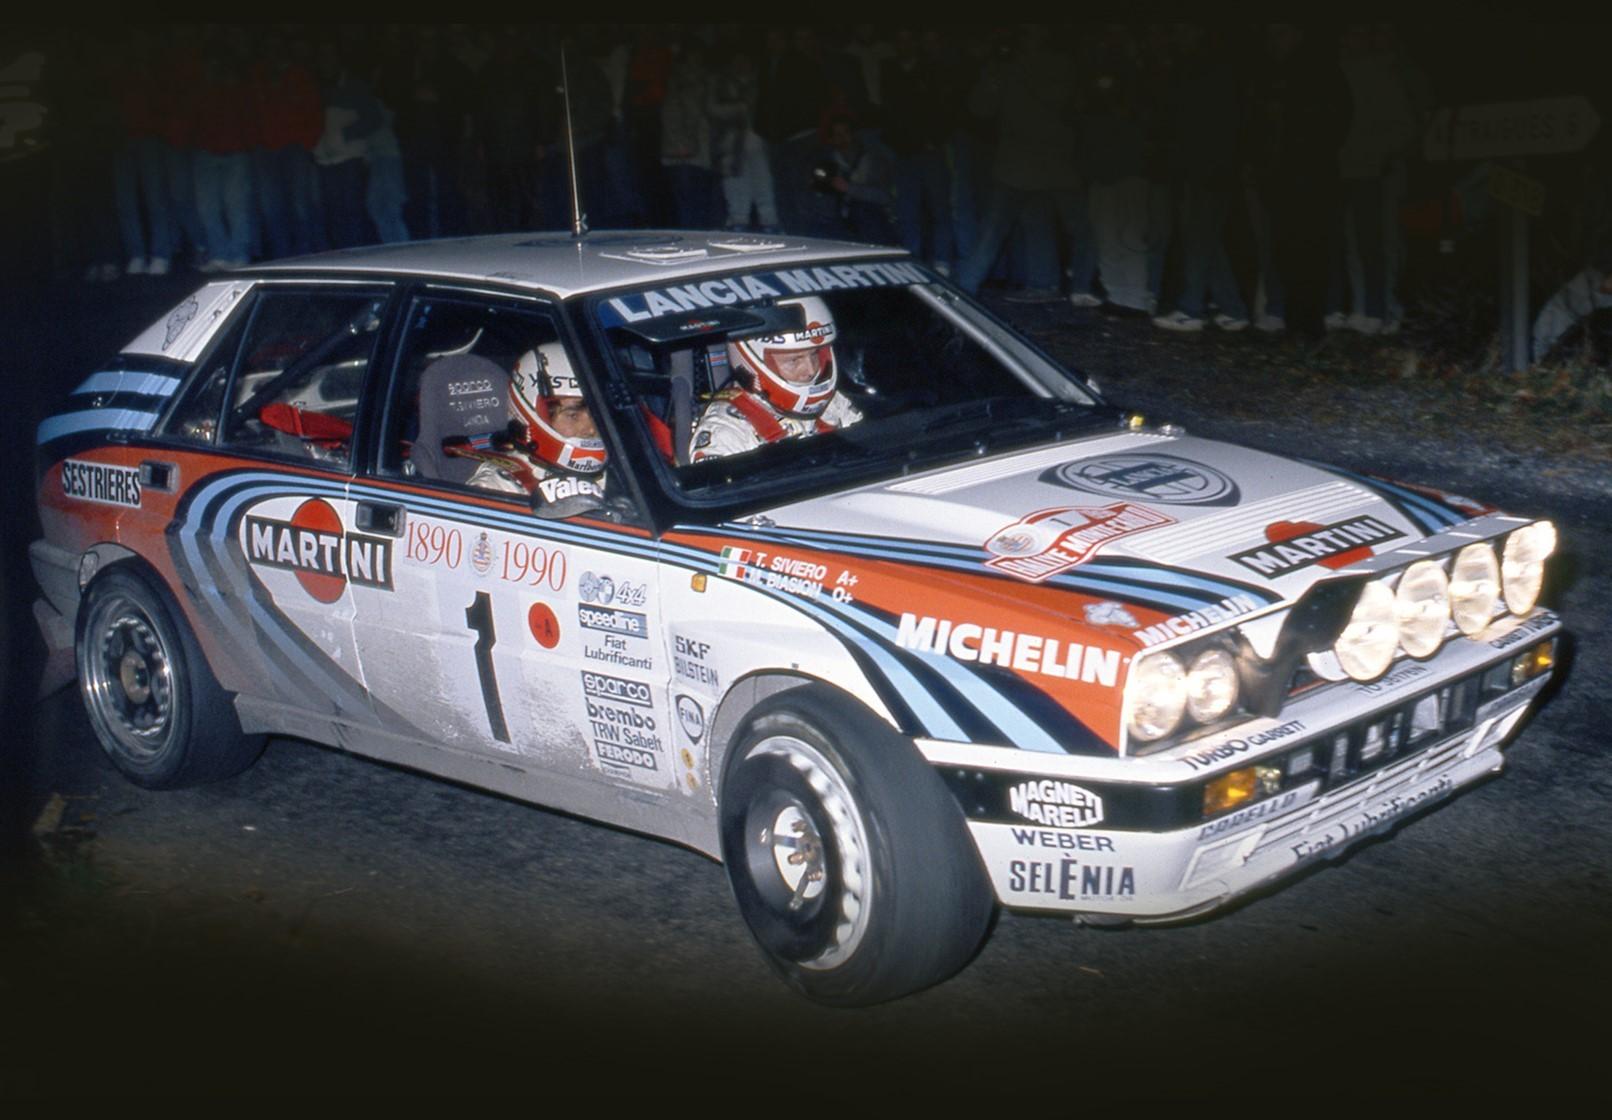 lancia-delta-integrale-hf-16v-7-rallye-monte-carlo-1990-auriol-ocelli-bbr-bbrc1841